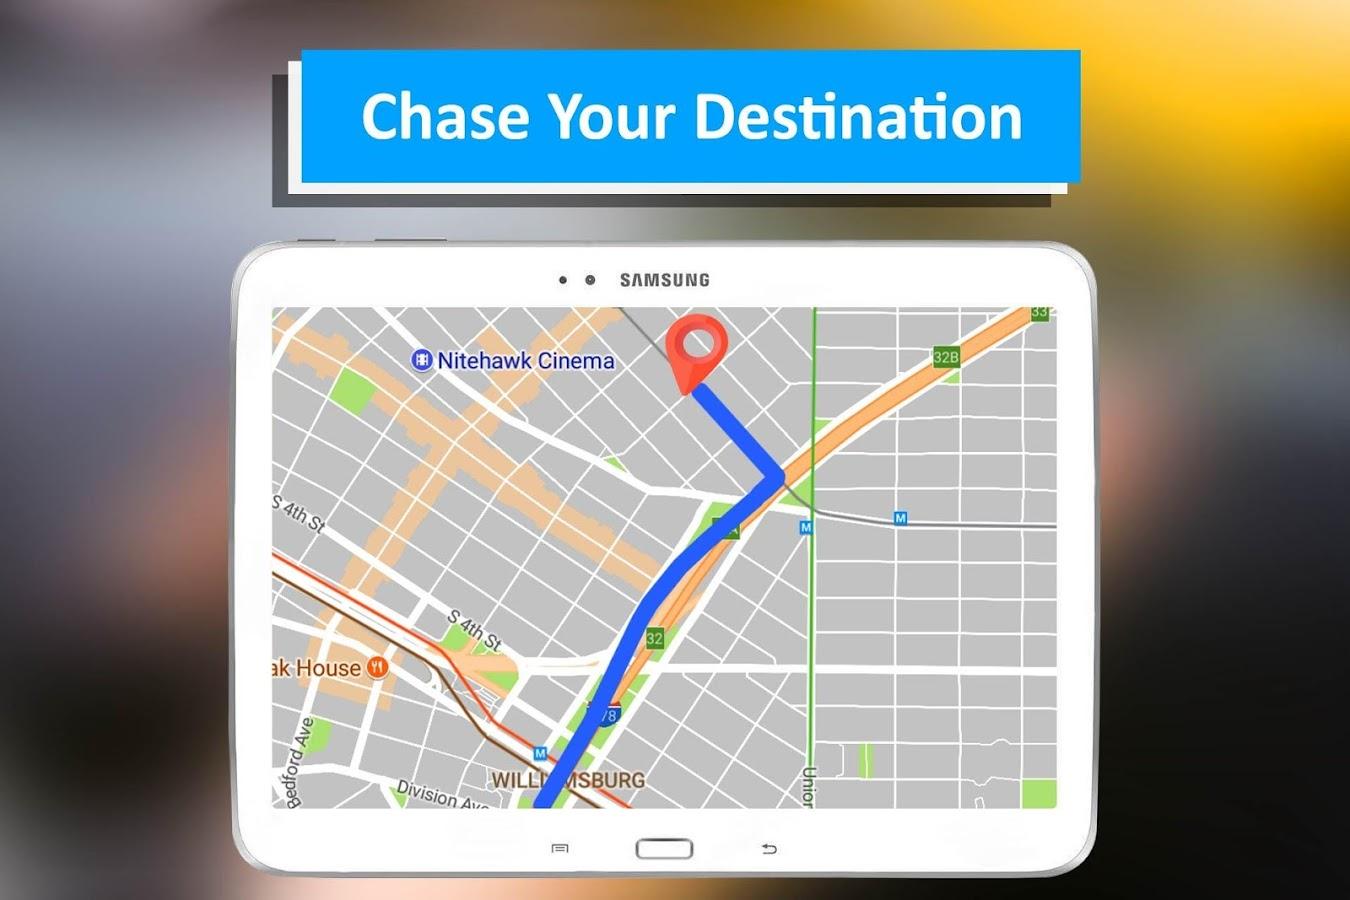 Global gps free live mapsnavigationstreet view android apps global gps free live mapsnavigationstreet view screenshot gumiabroncs Images